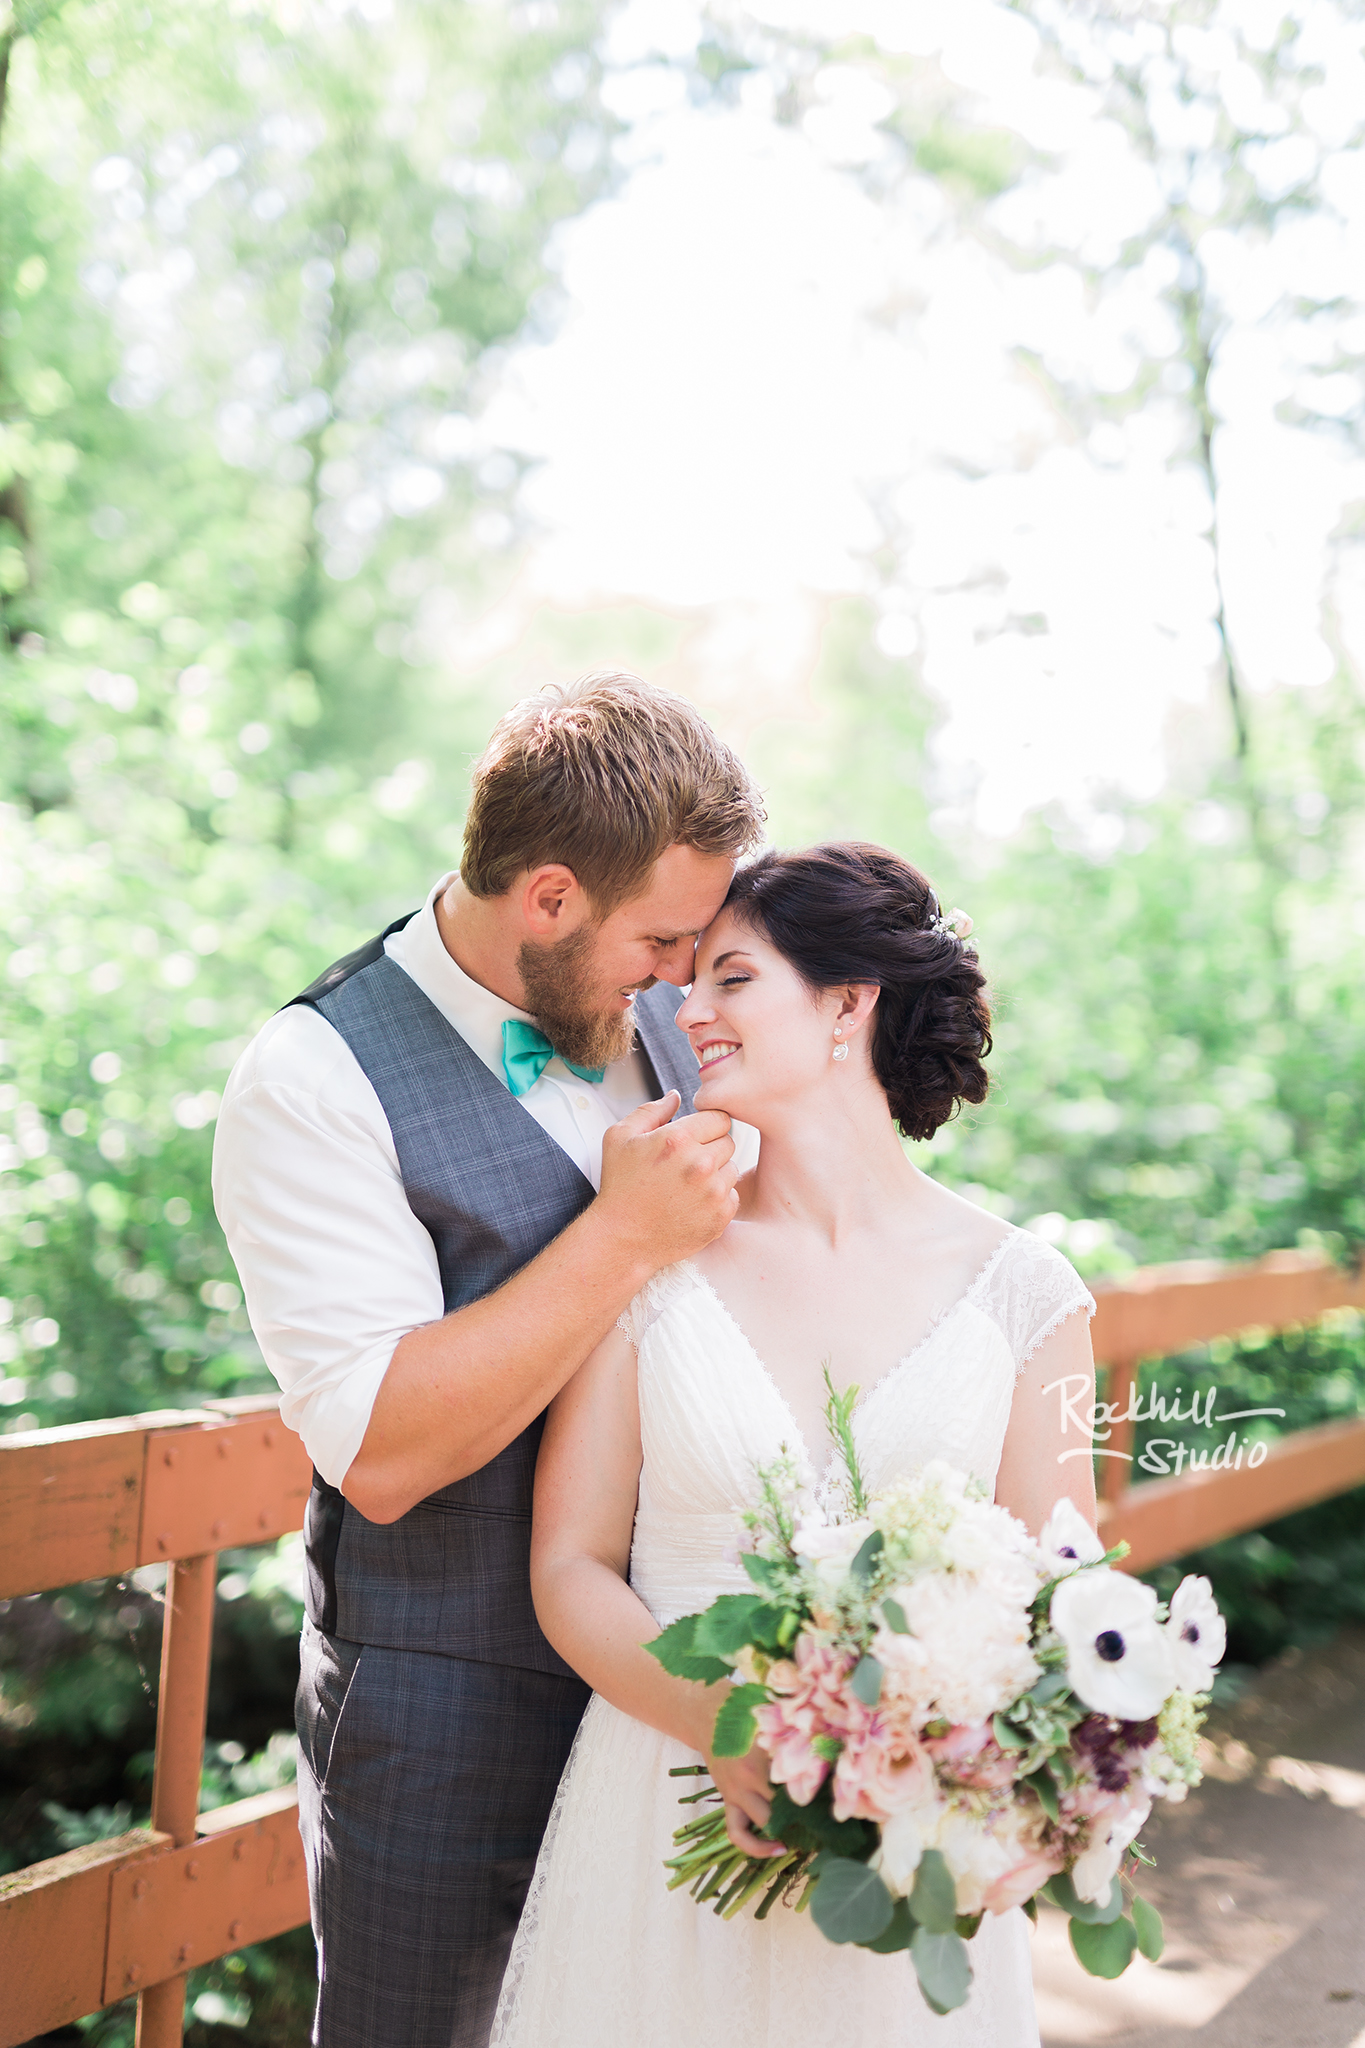 traverse-city-wedding-photographer-rockhill-jl-michigan-2.jpg